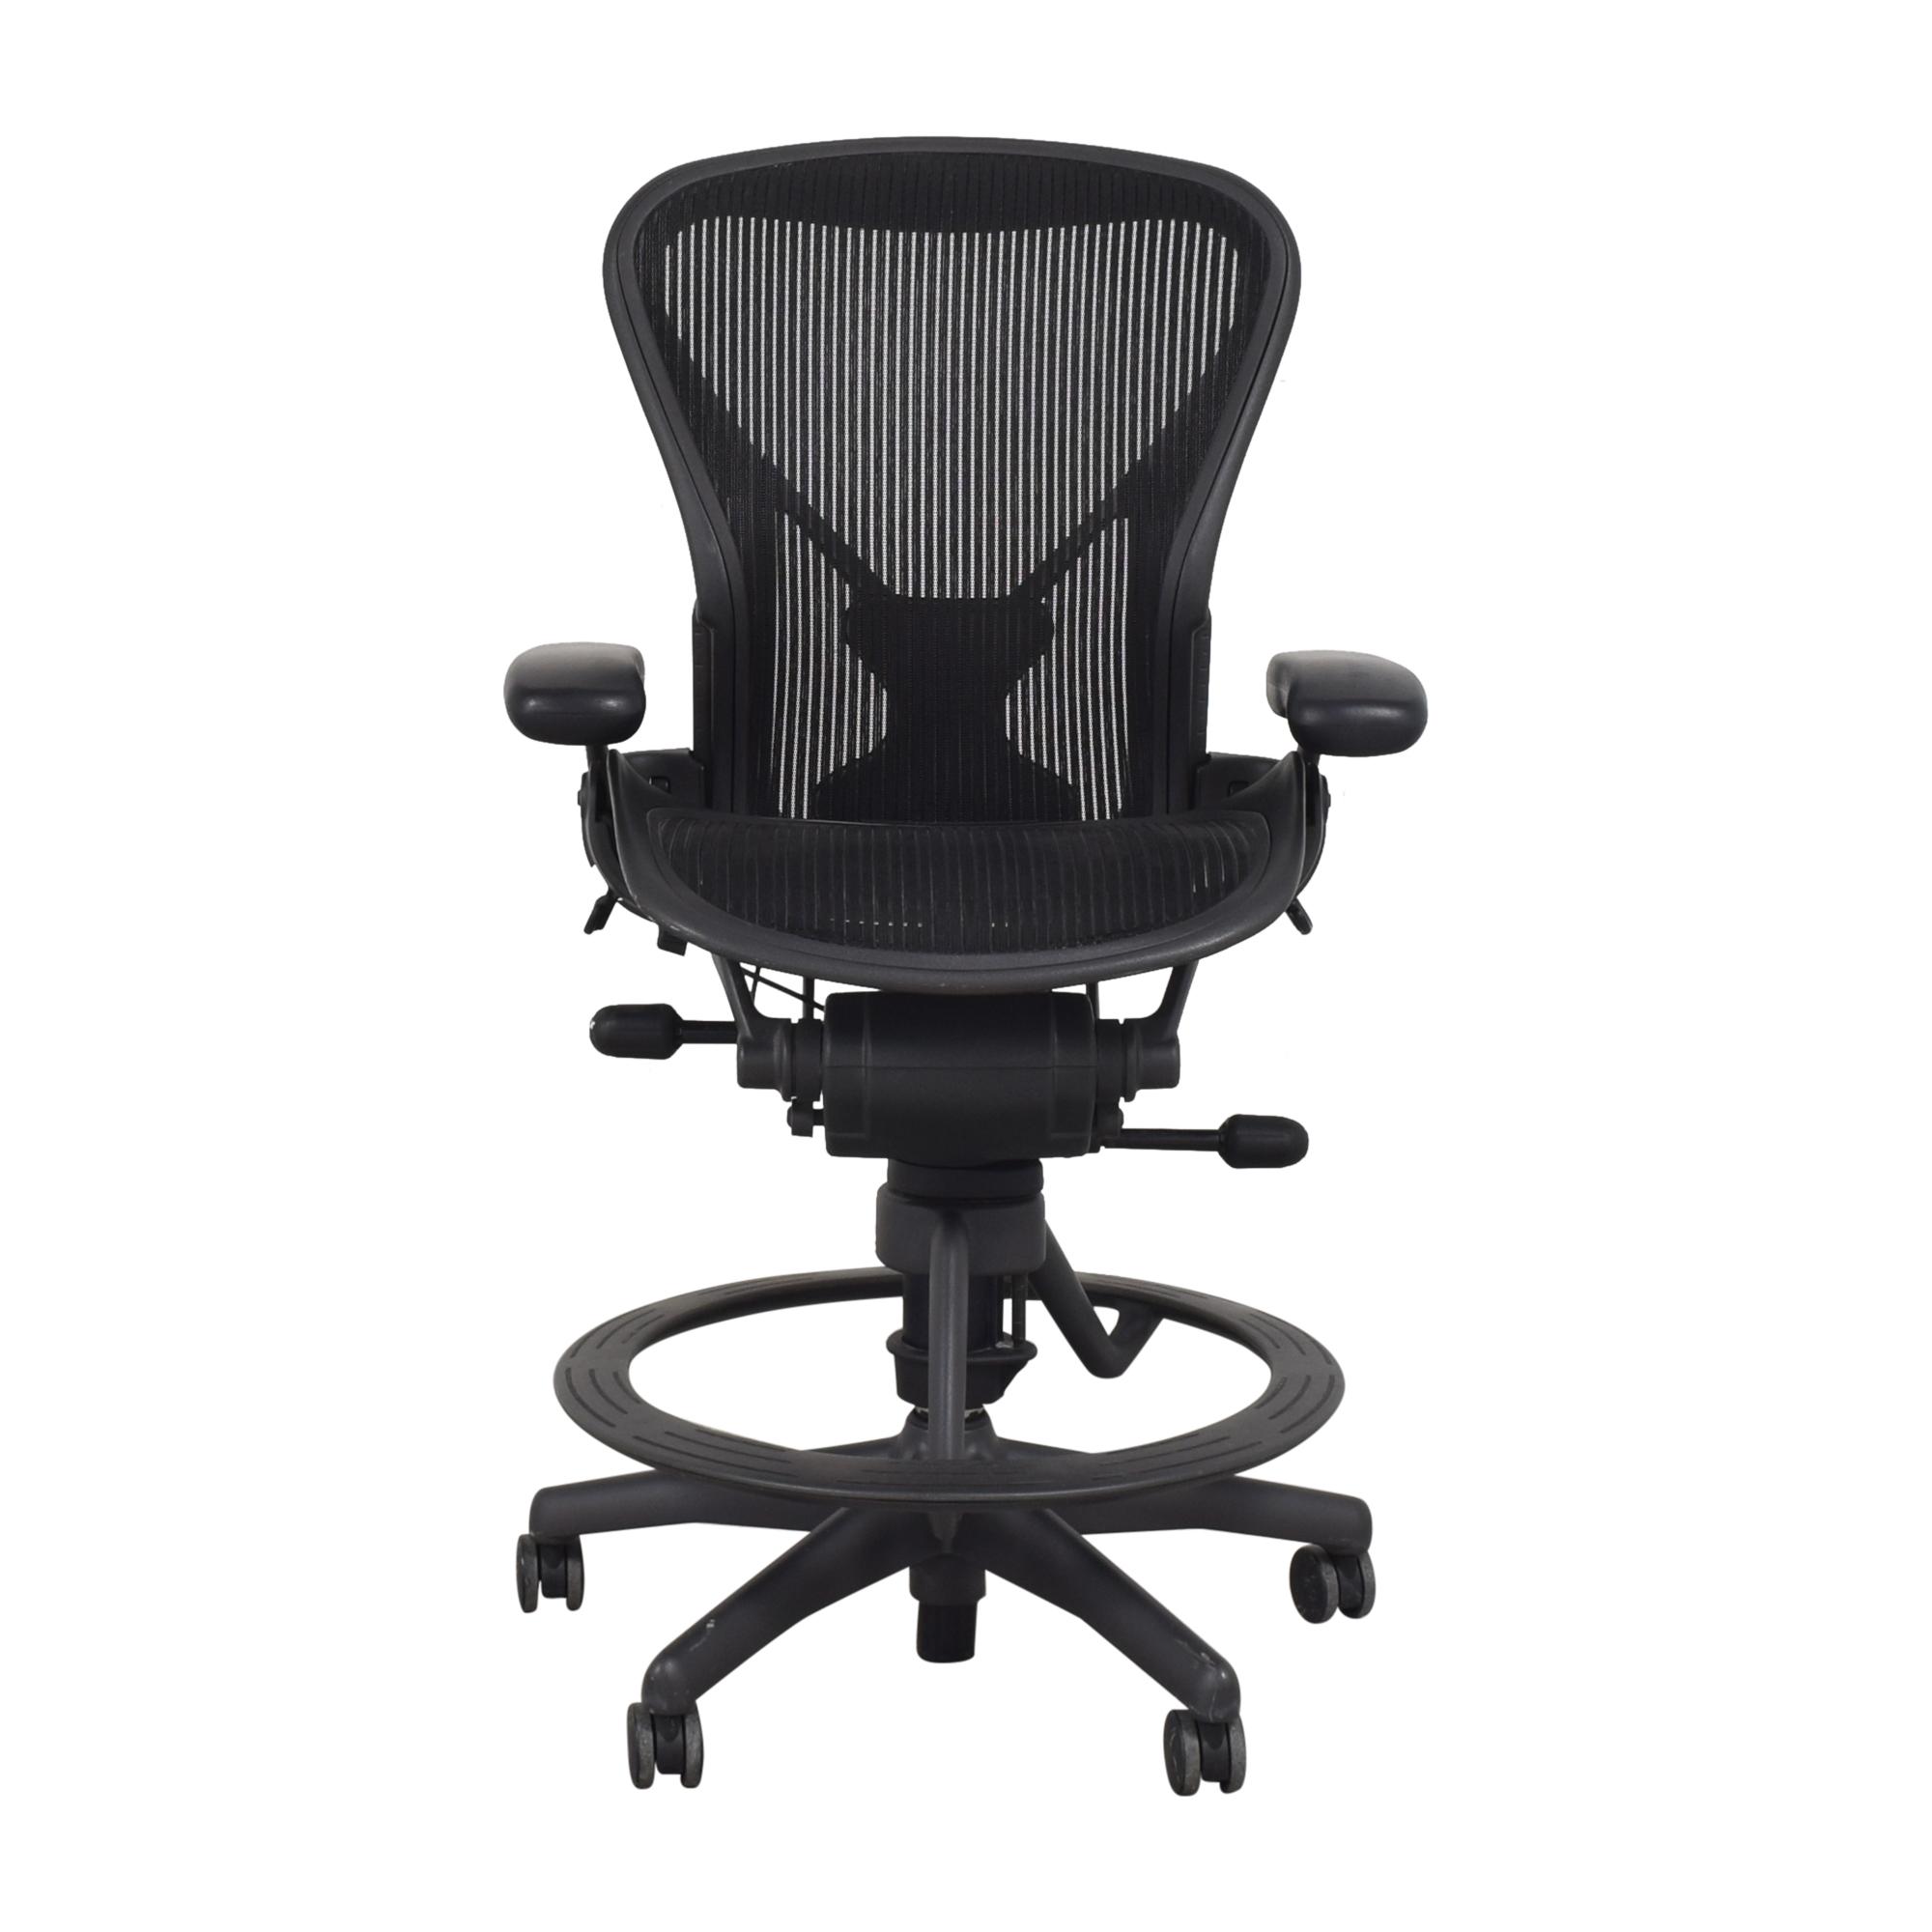 Herman Miller Herman Miller Aeron Stool Drafting Chair Home Office Chairs